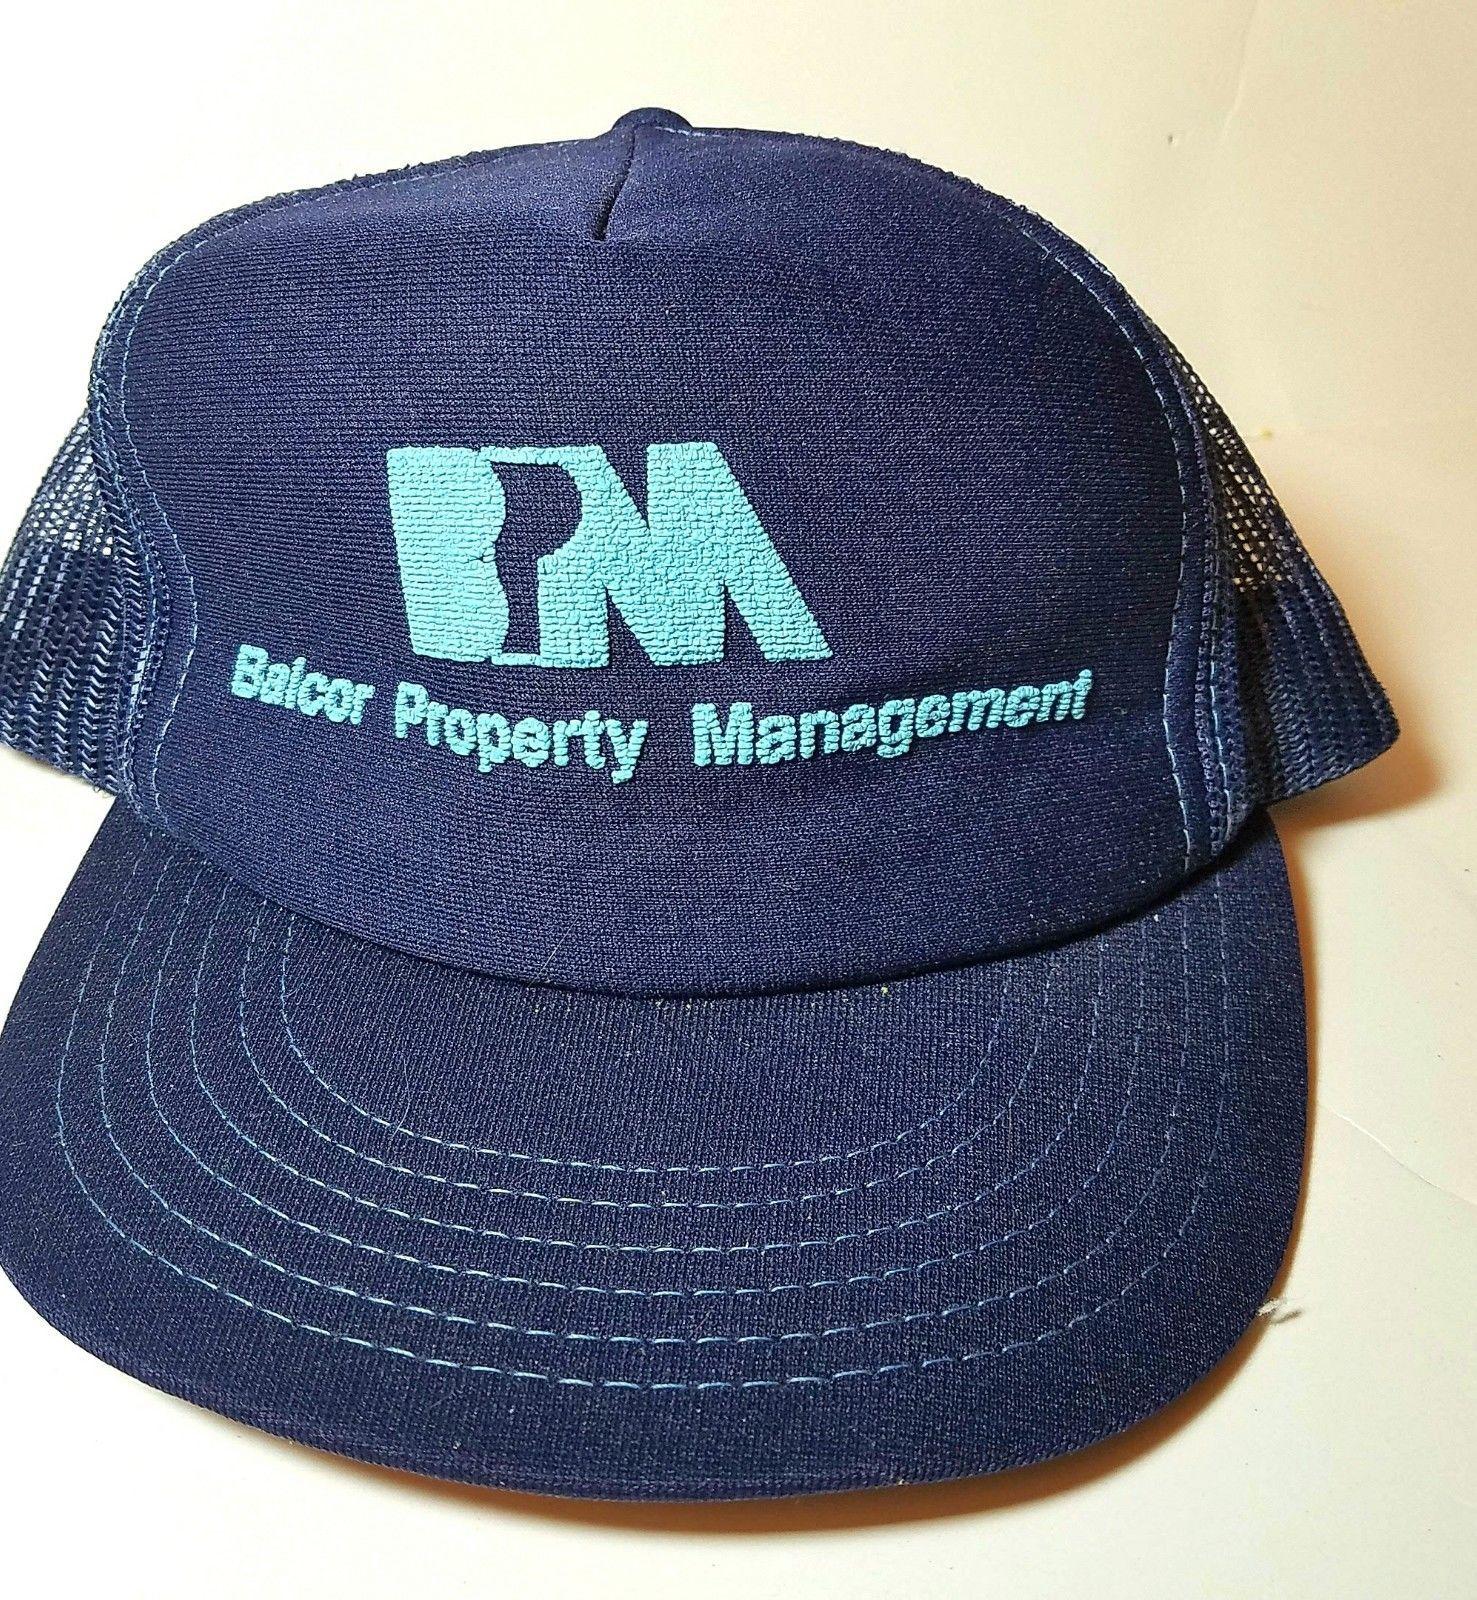 S l1600. S l1600. Vintage 1980s Balcor Property Trucker Mesh Foam Snapback  Hat cap ... cecd40d04f6b